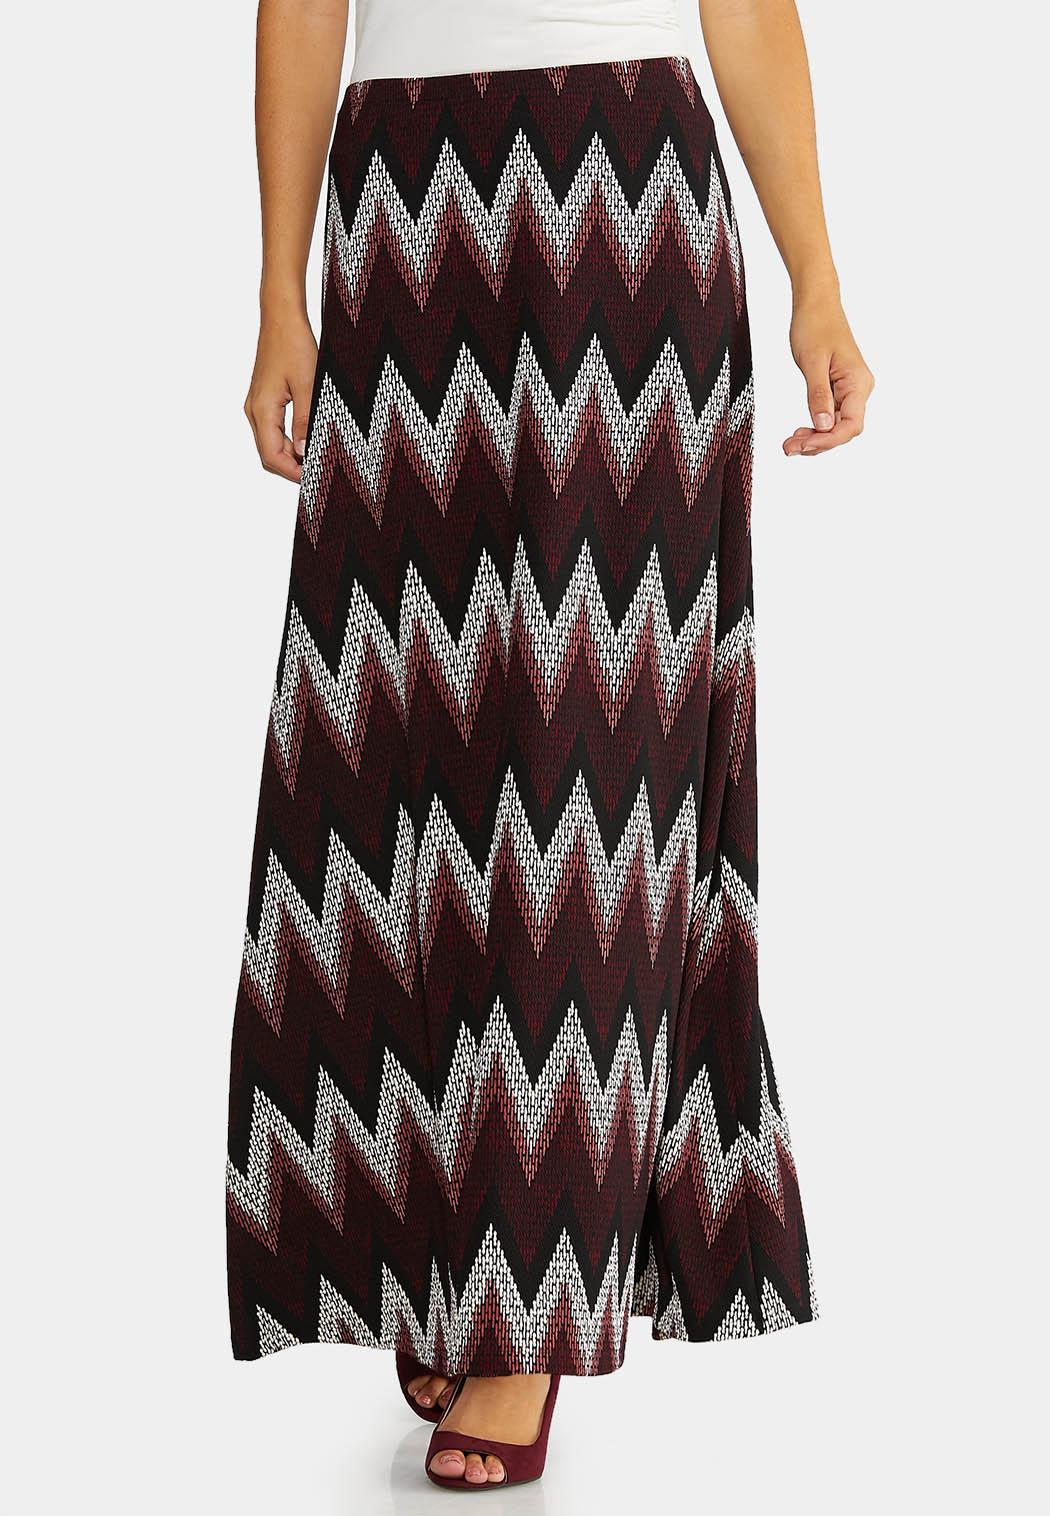 Plus Size Puff Chevron Maxi Skirt Maxi Cato Fashions